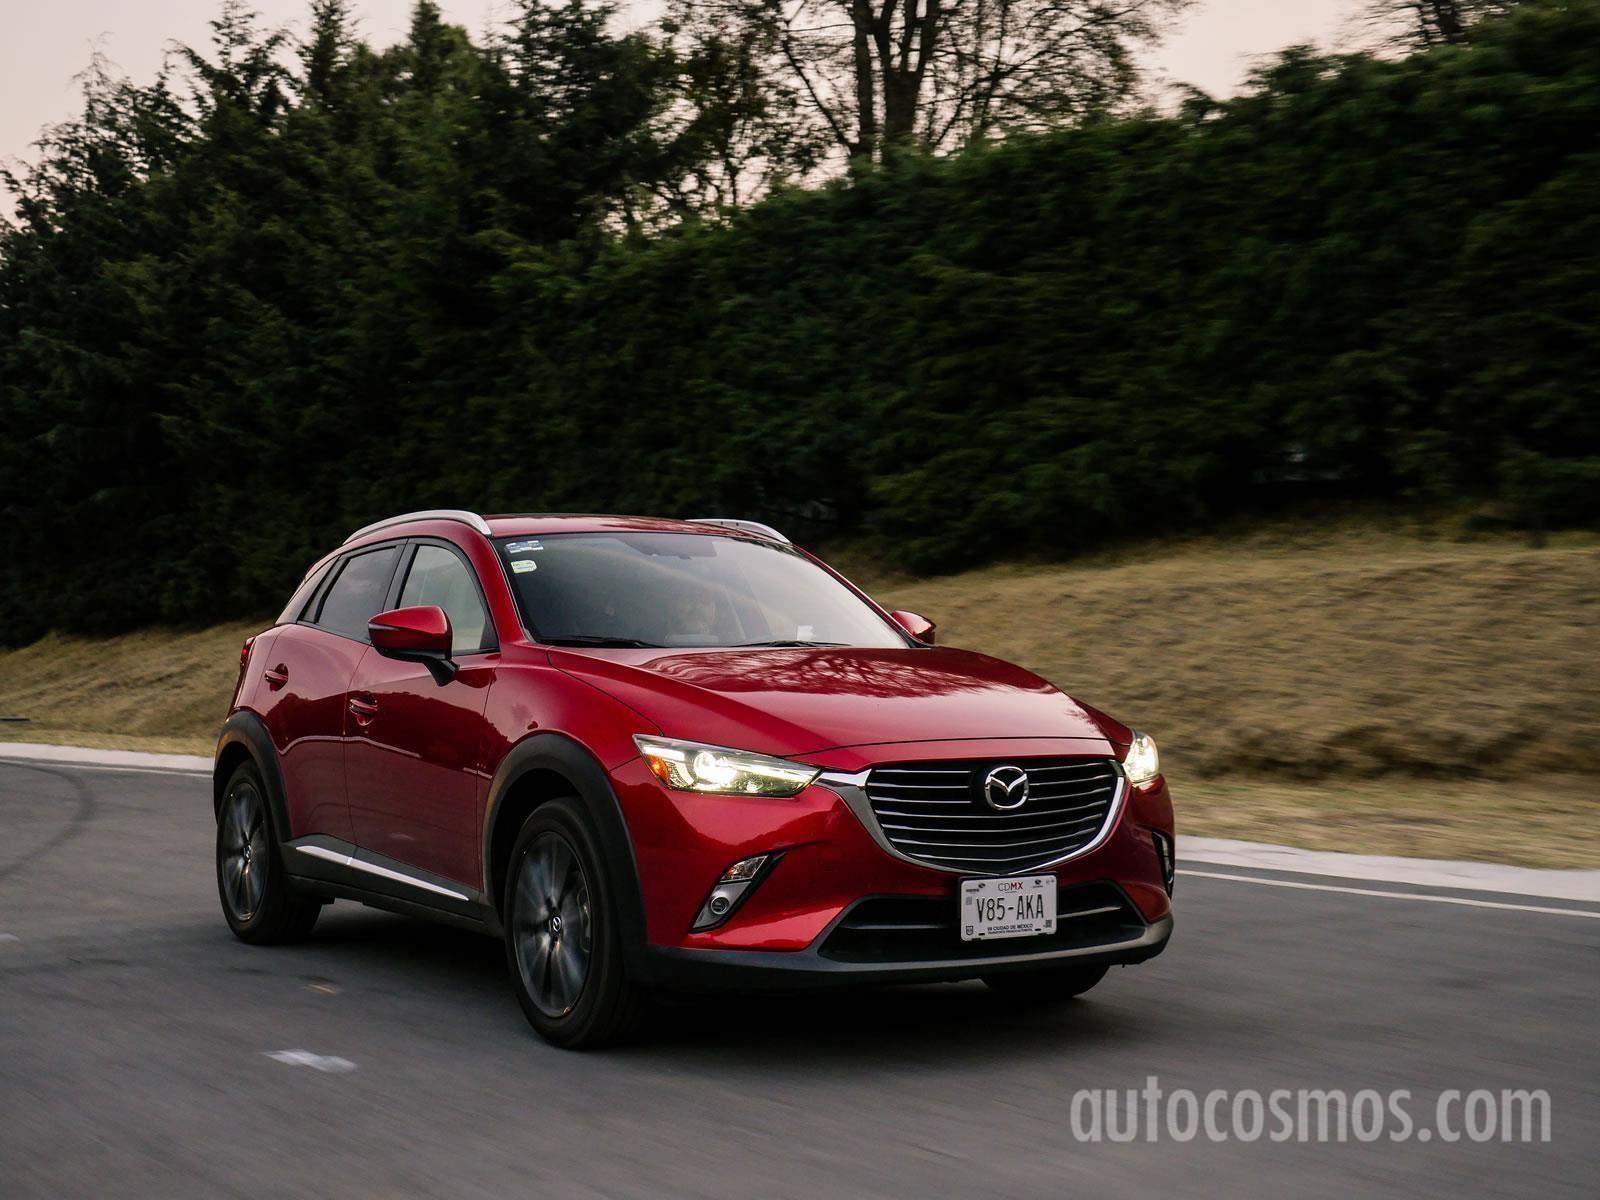 Cx 3 Vs Hrv >> Comparativa: Mazda CX-3 vs Nissan Kicks vs Chevrolet Trax vs Honda HR-V - Autocosmos.com